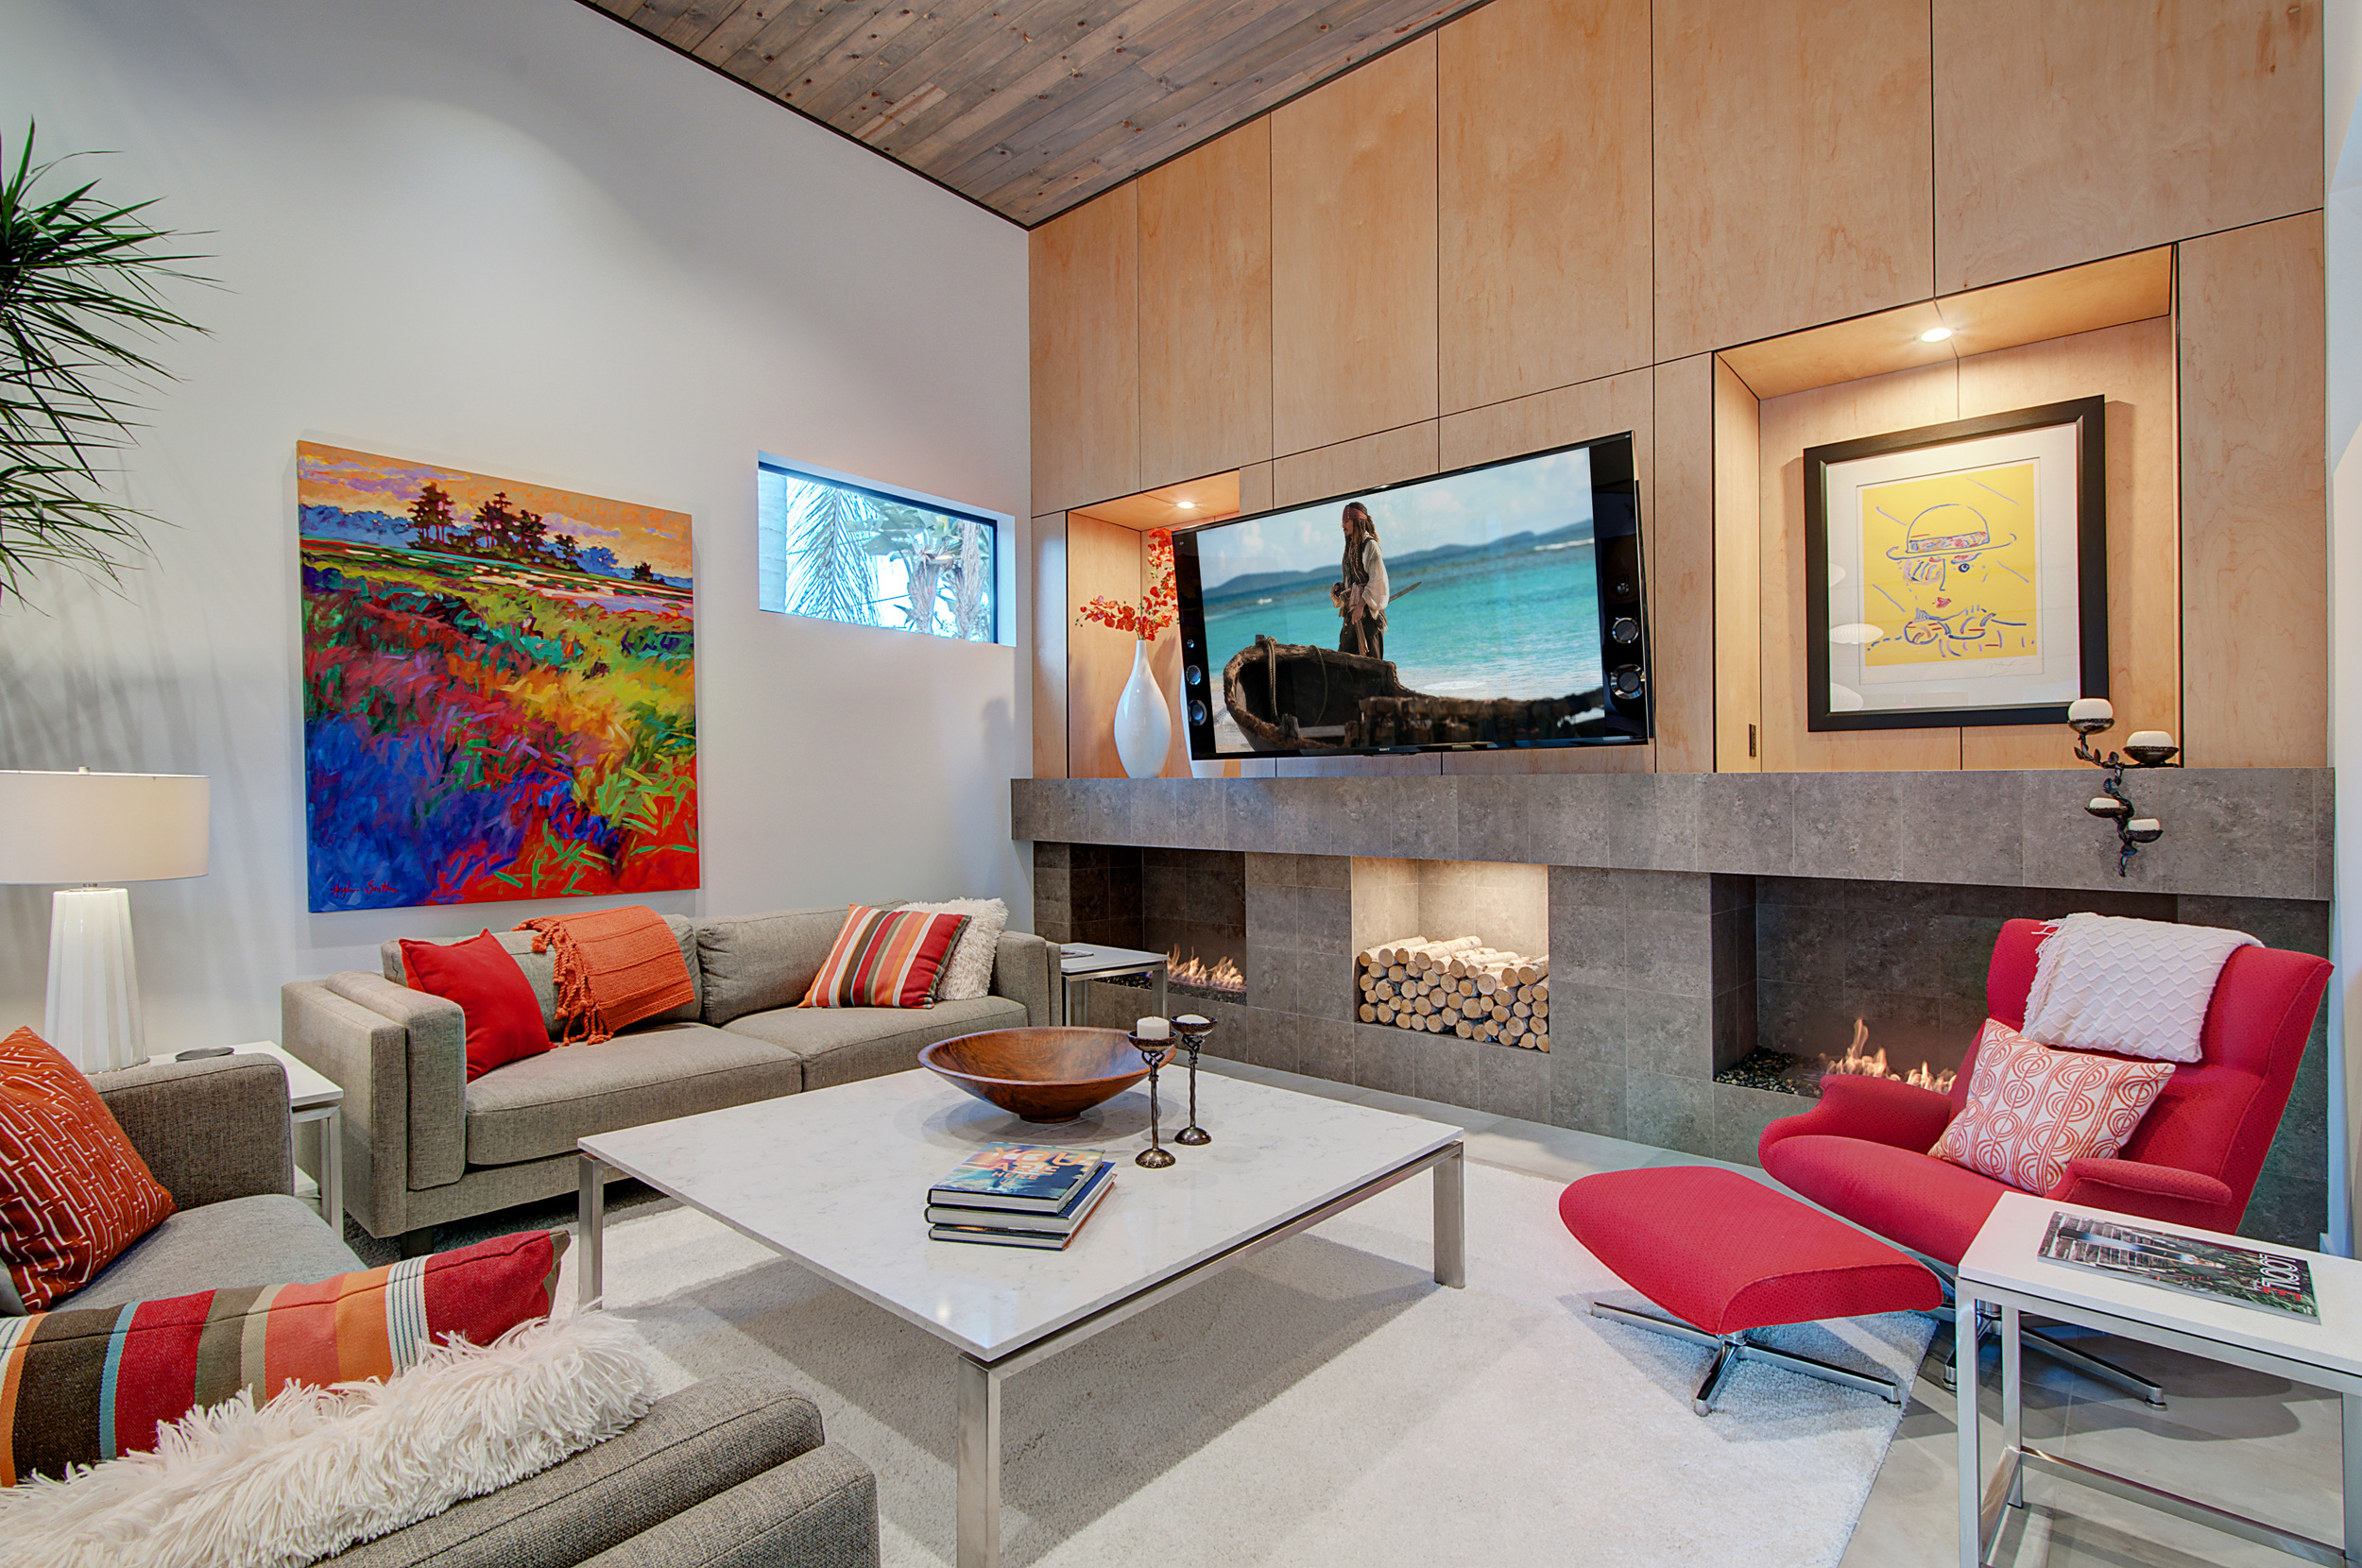 LR_Living Room-1.jpg